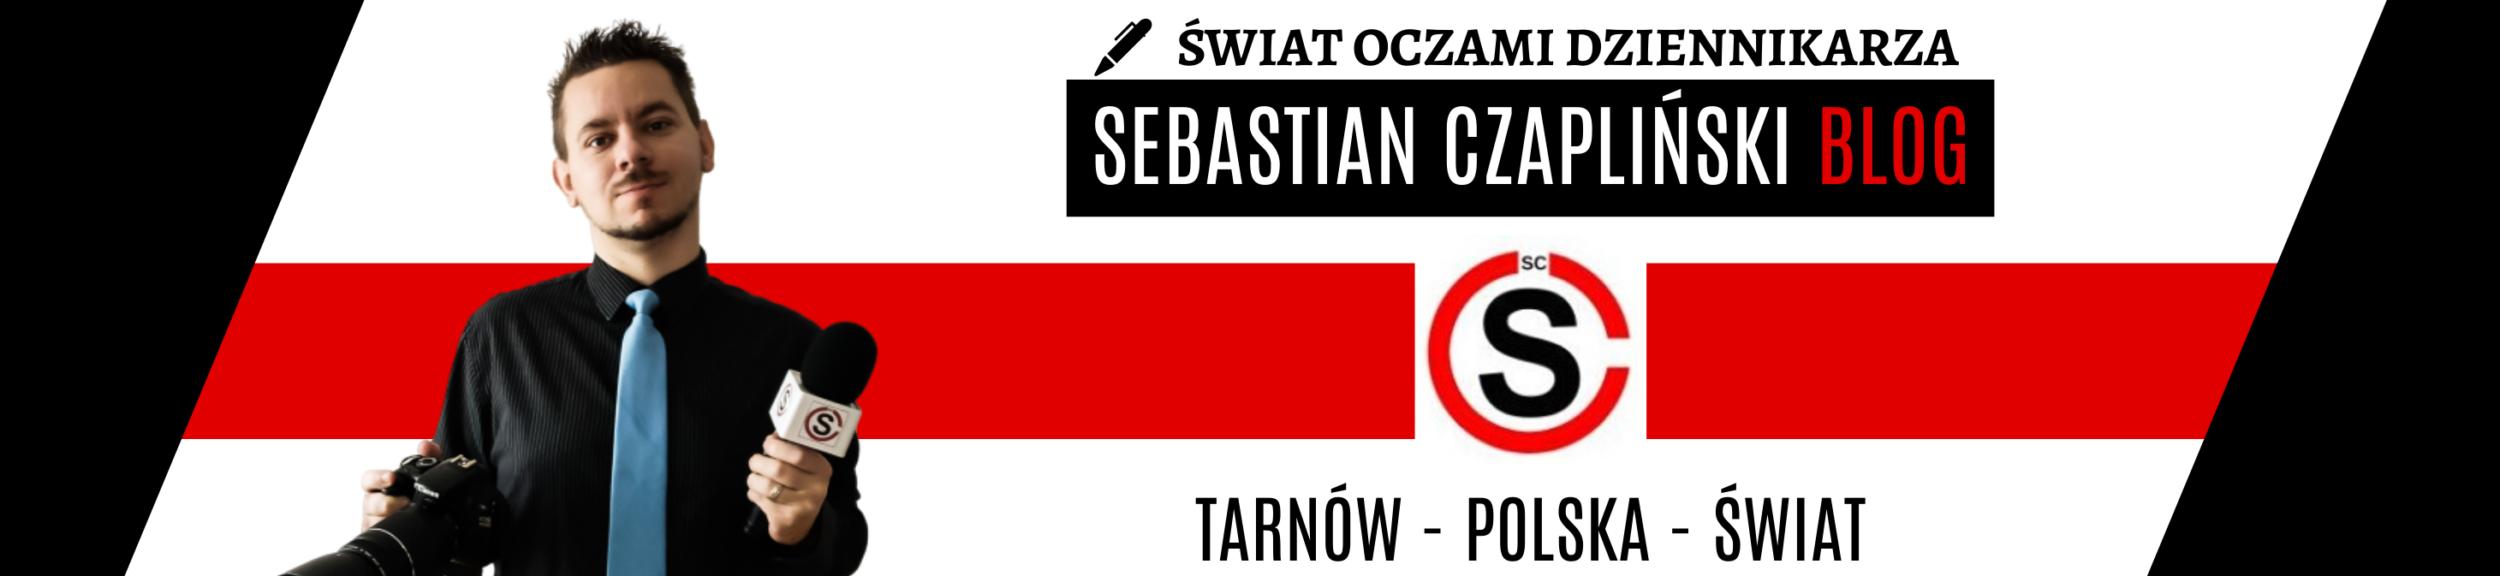 Sebastian Czapliński